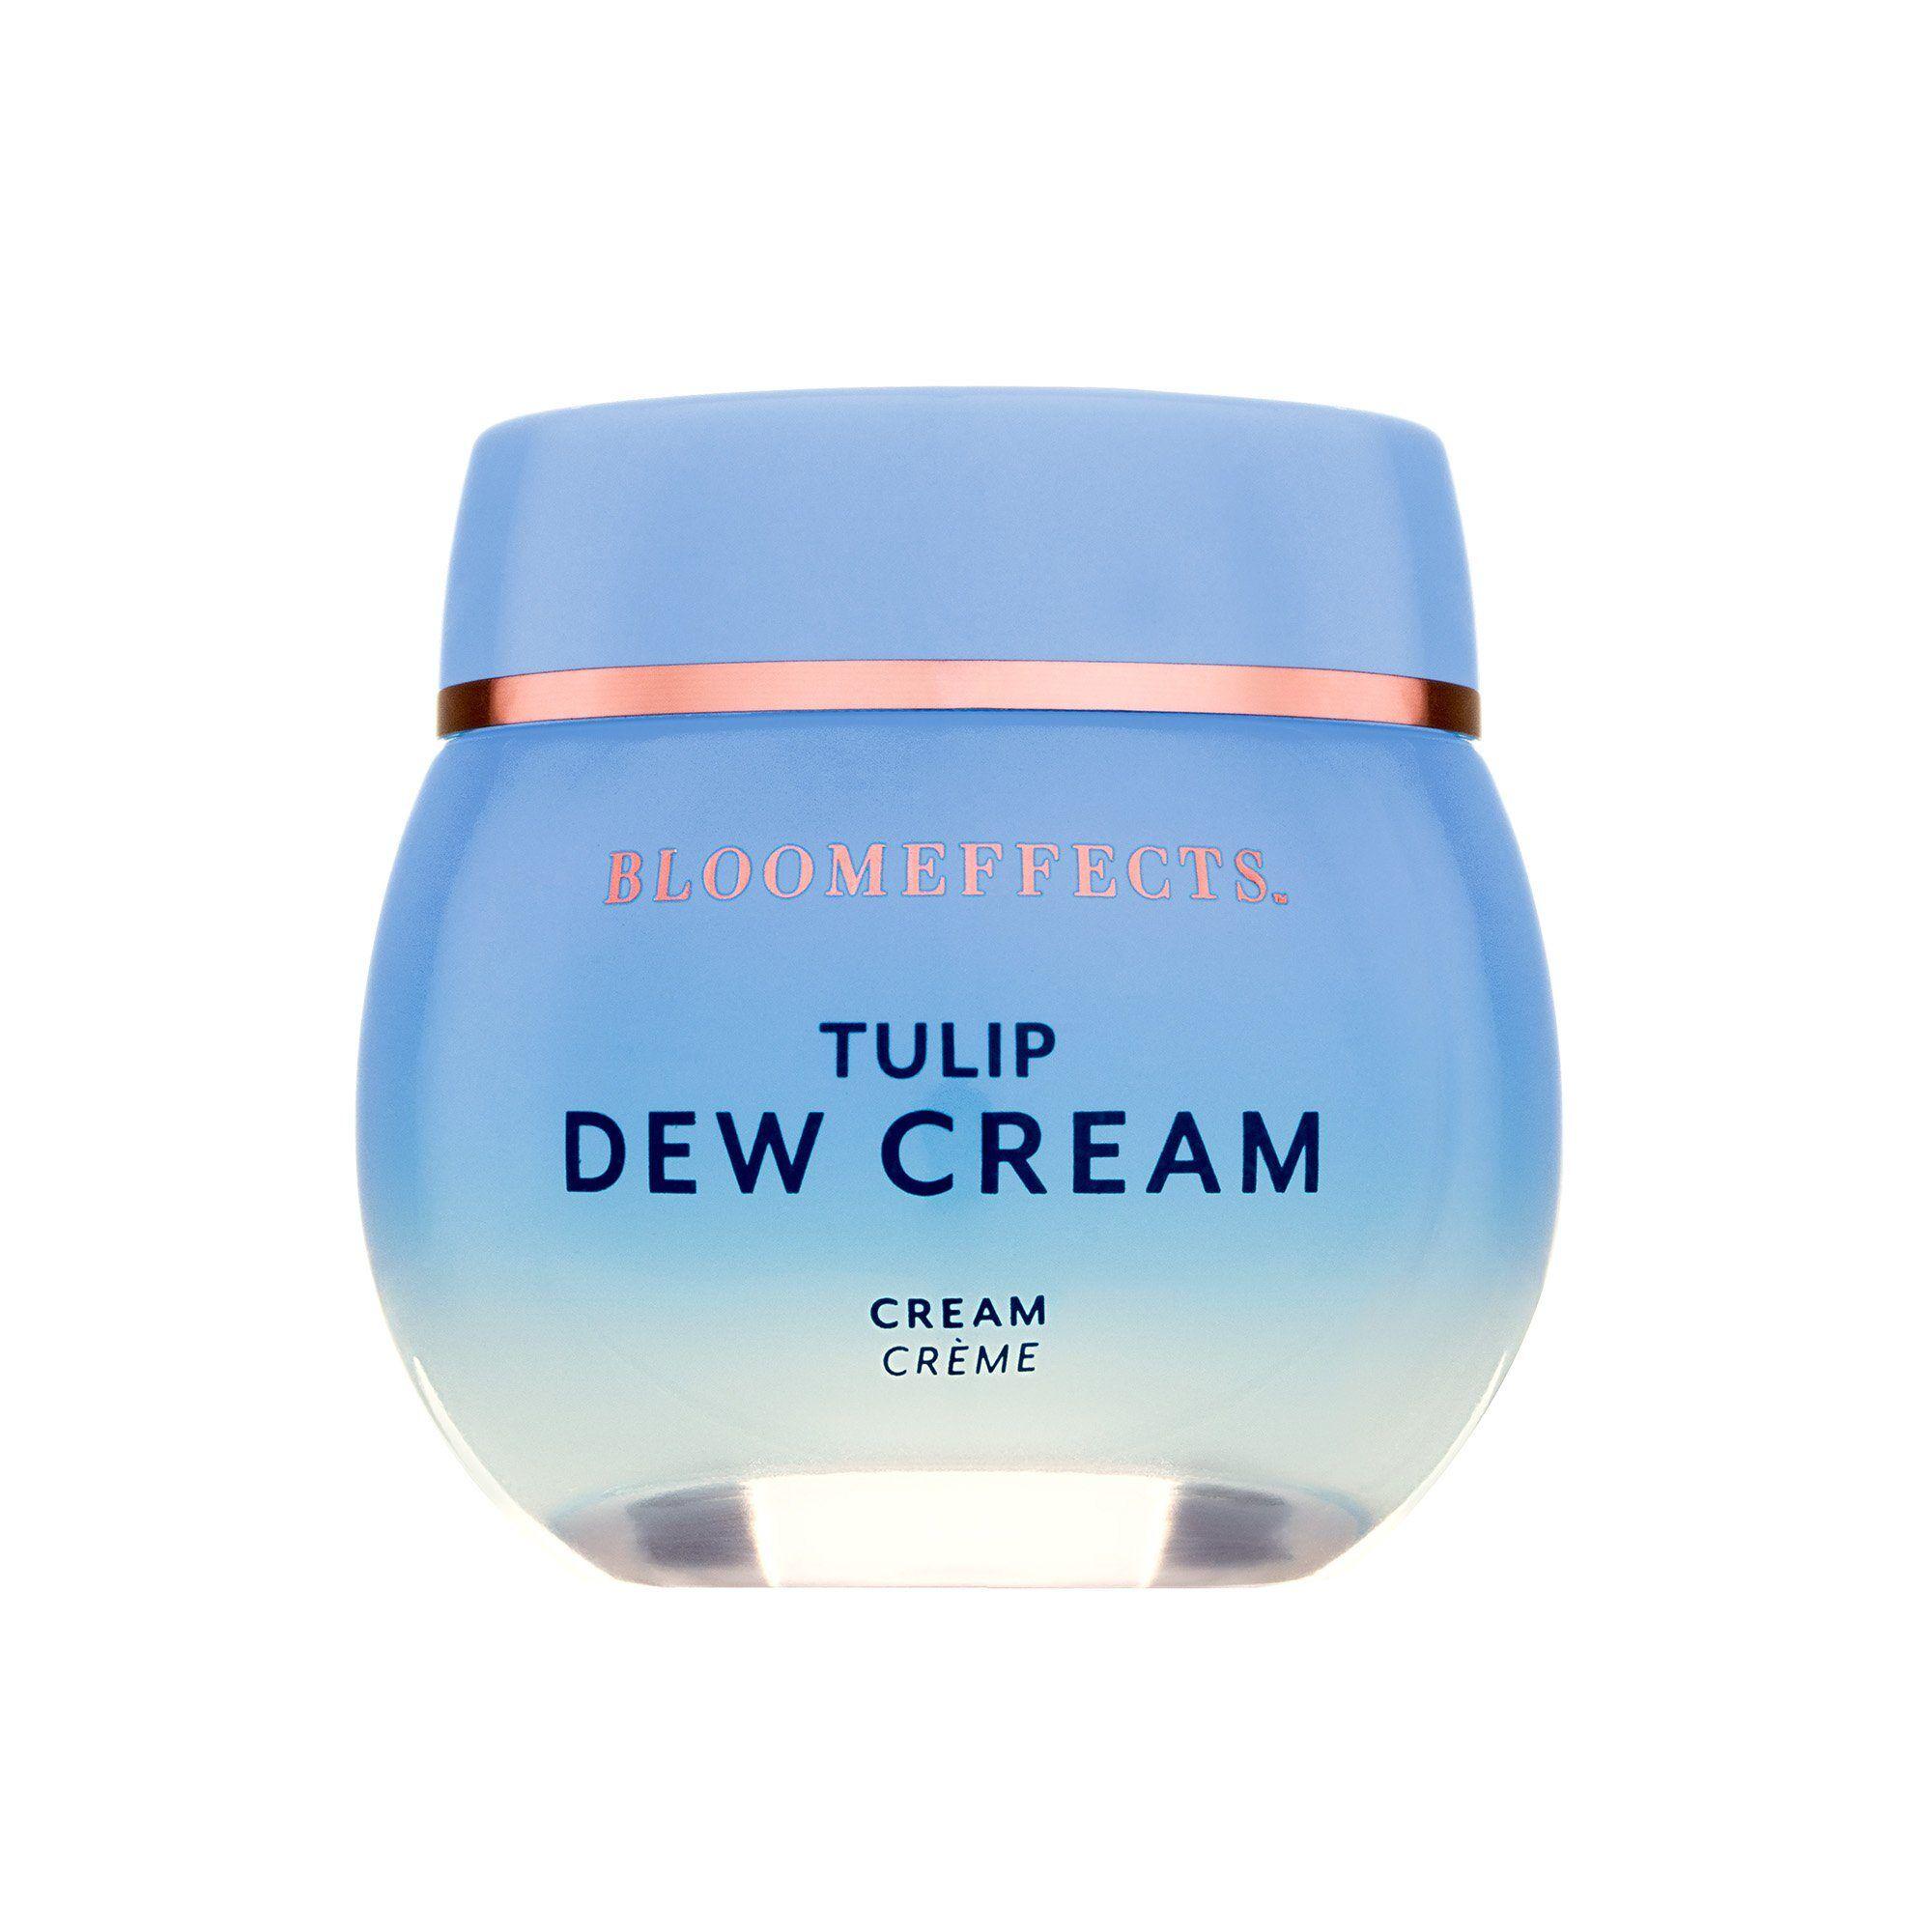 Bloomeffects - Tulip Dew Cream